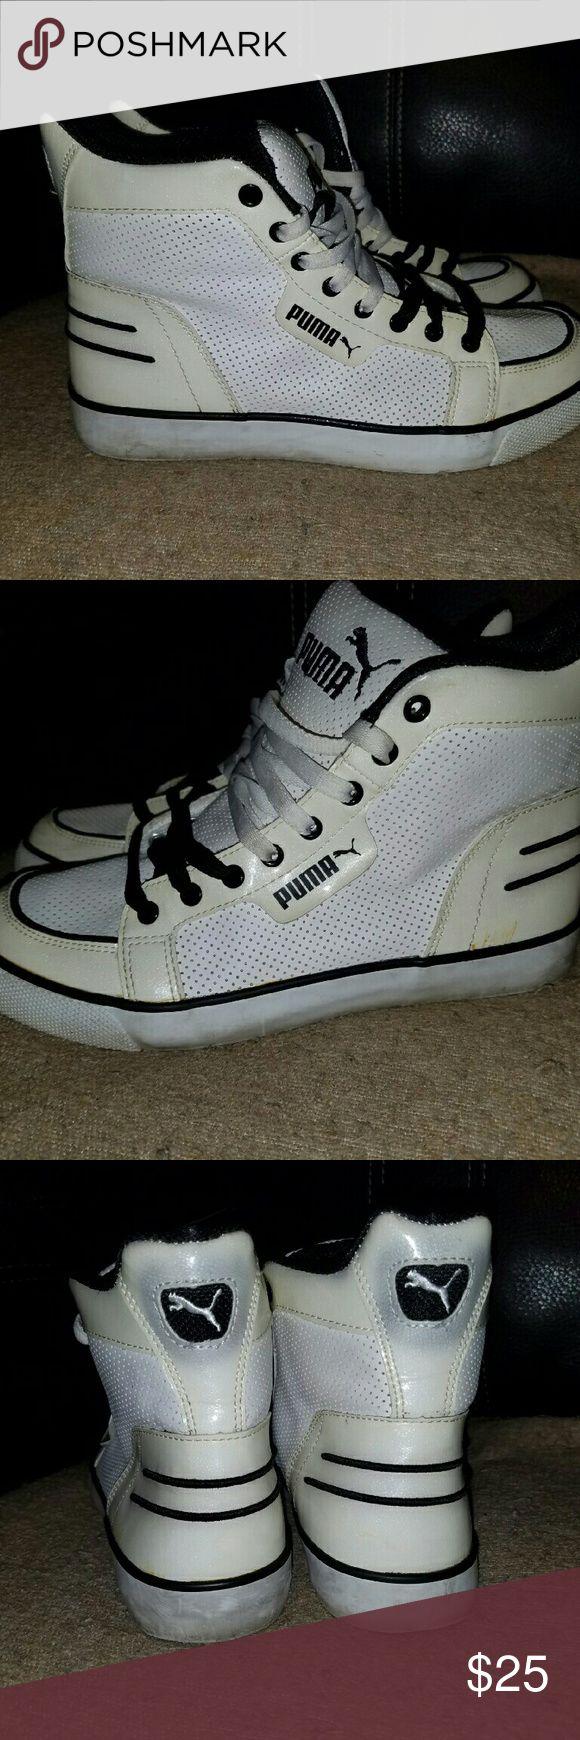 Puma shoes womens Womens puma shoes used worn as is no box good condition Puma Shoes